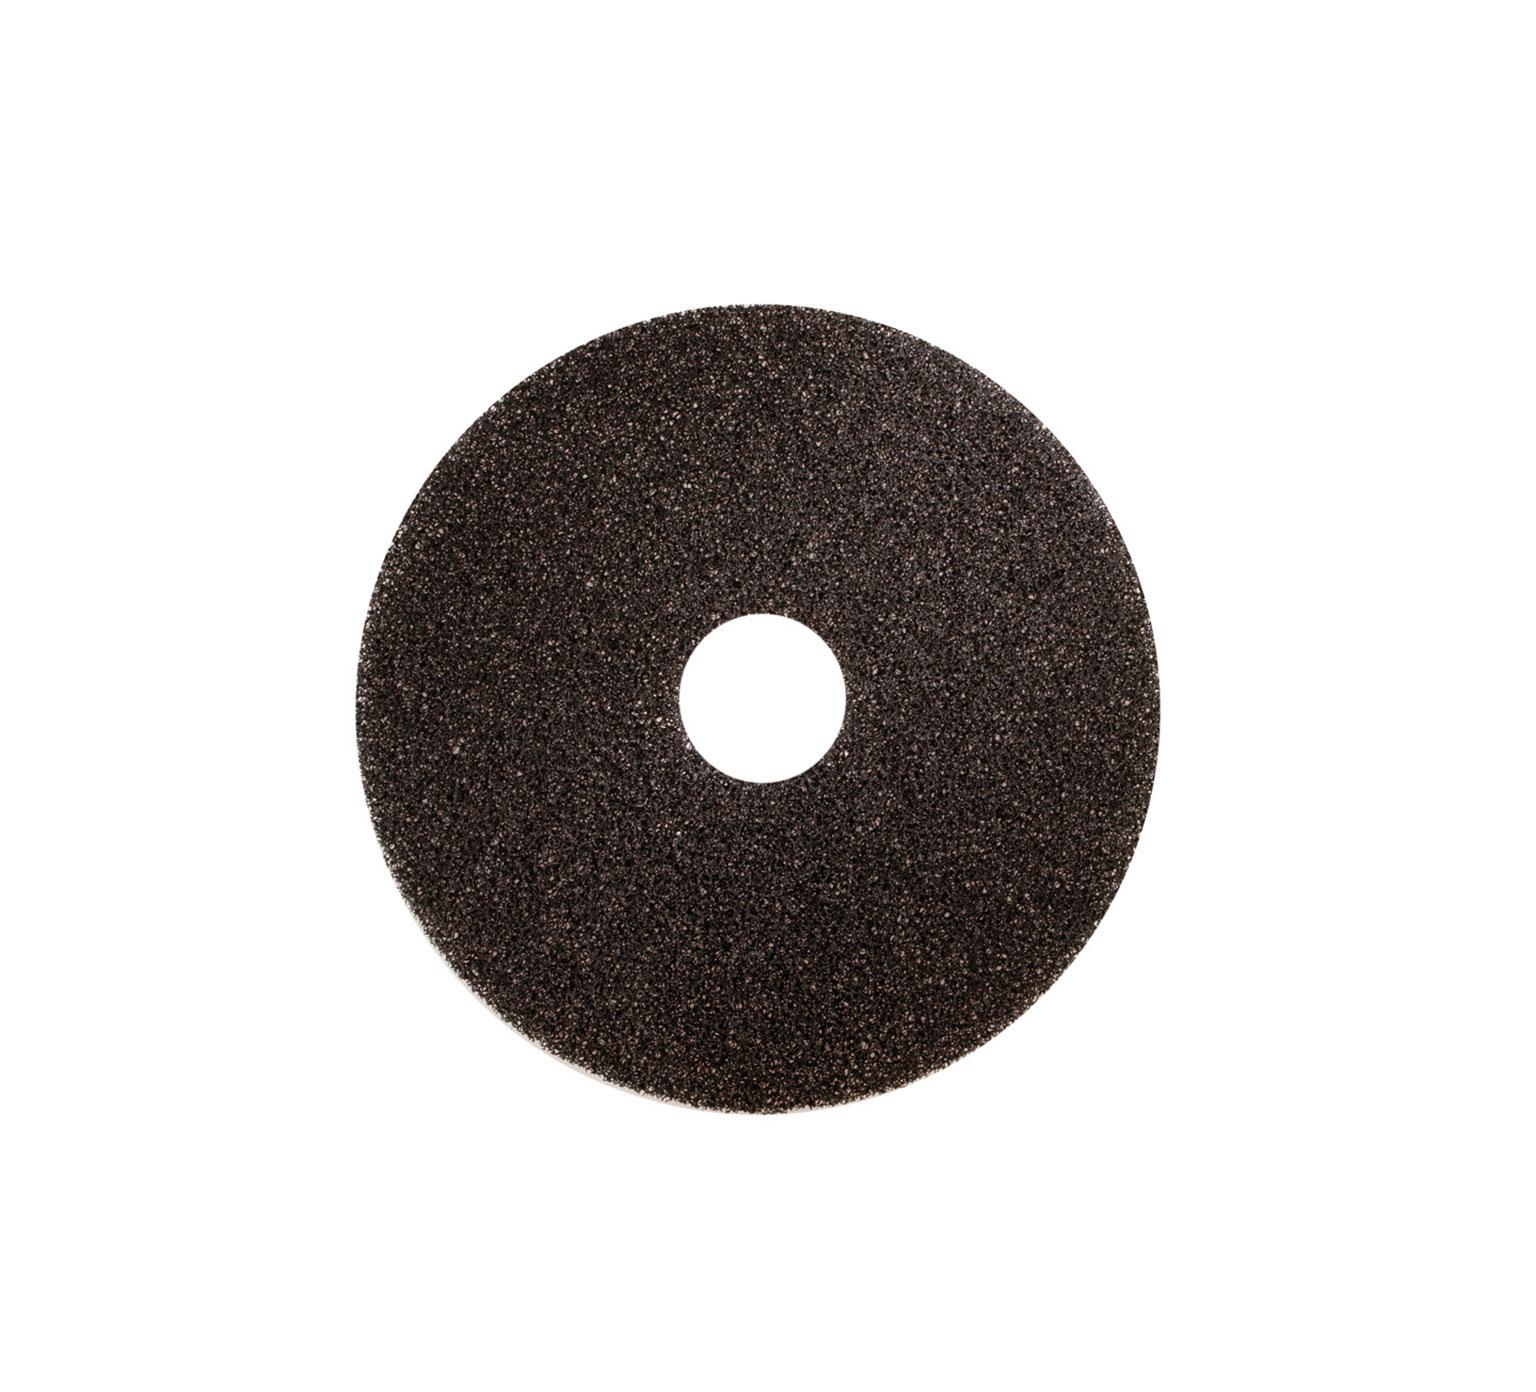 3m Black Stripping Pad 17 In 432 Mm 1050262